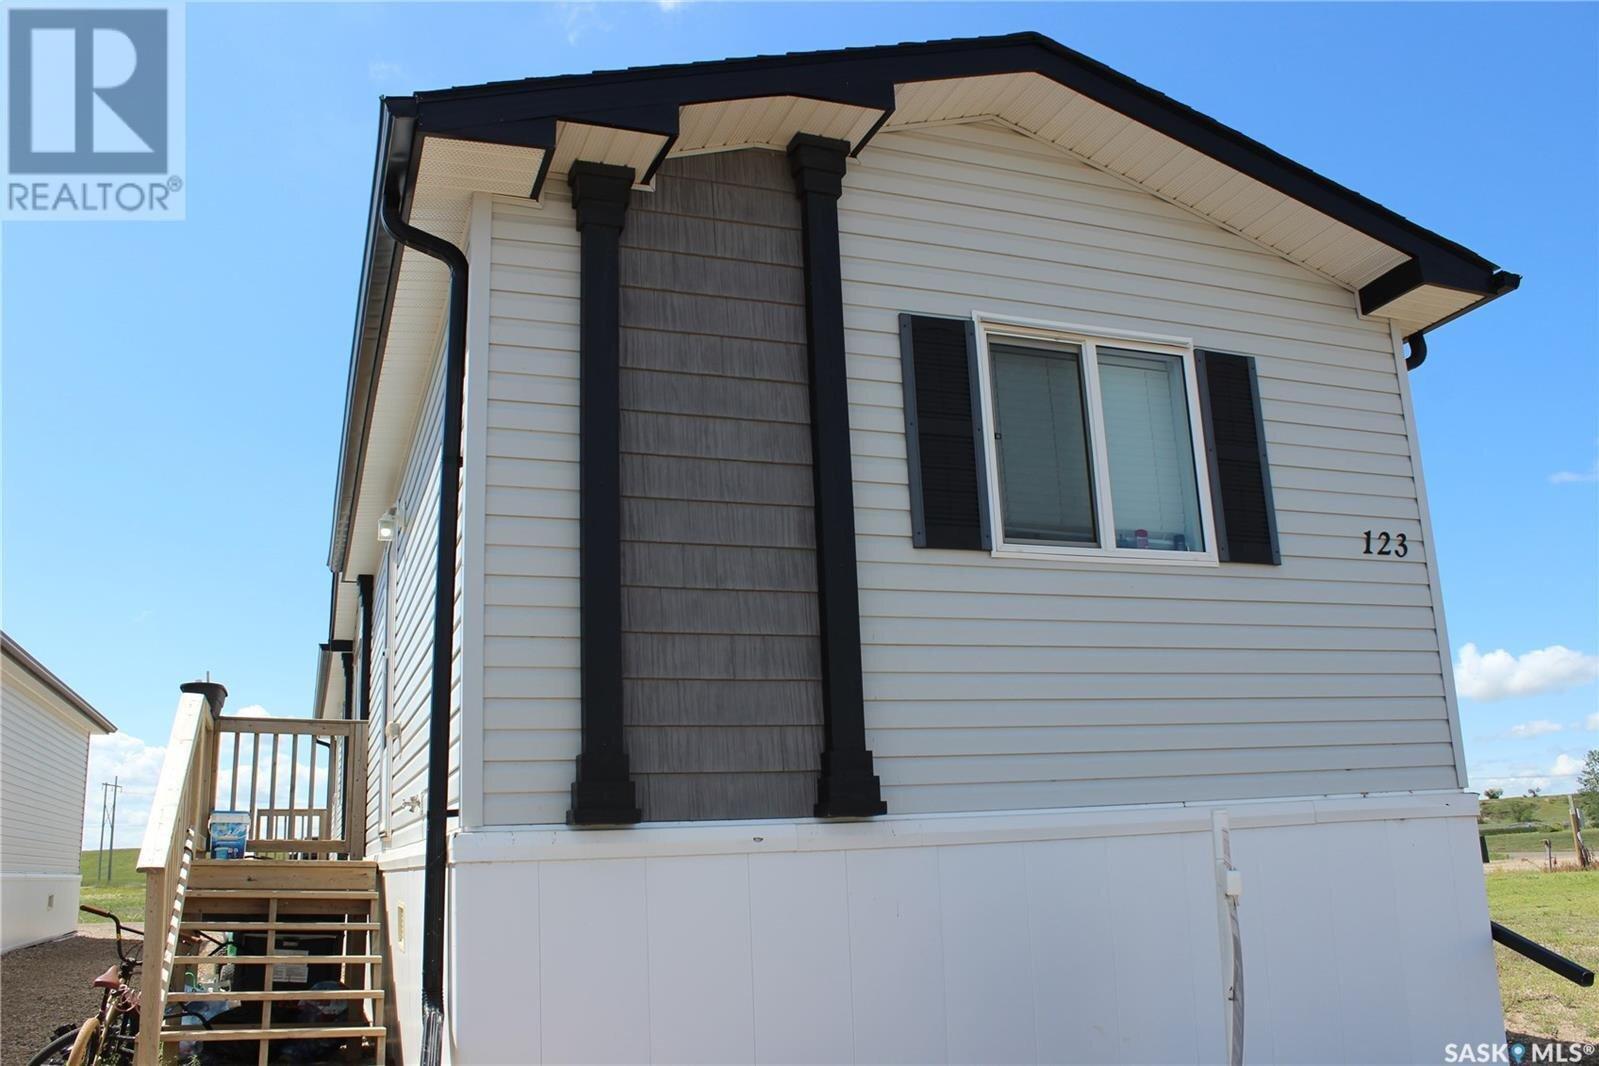 Residential property for sale at 123 Williams Wy Estevan Saskatchewan - MLS: SK833897